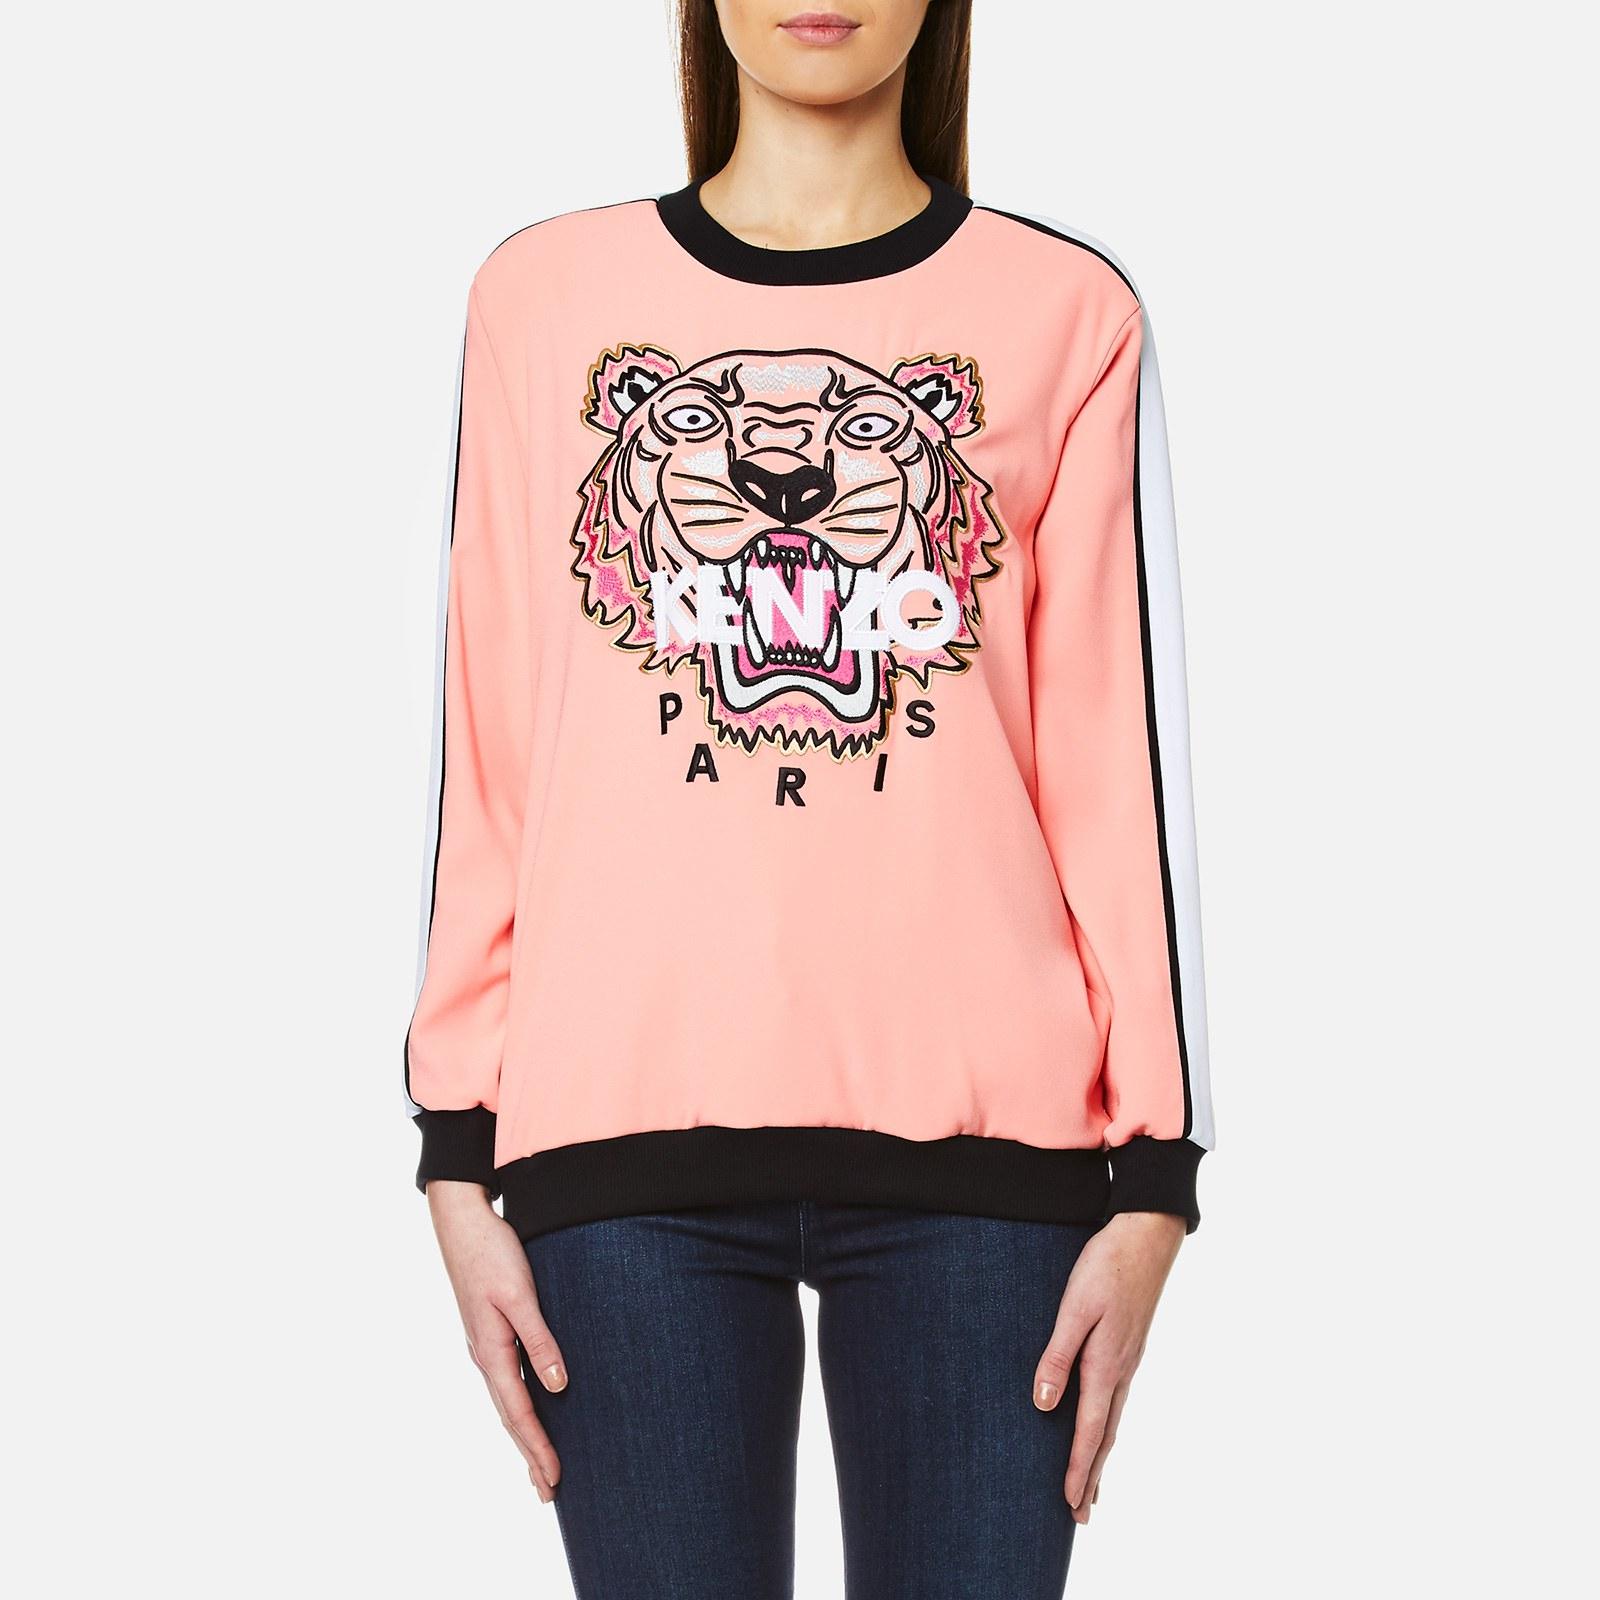 d8978b22b275 KENZO Women's Crepe Back Satin Tiger Sweatshirt - Flamingo Pink - Free UK  Delivery over £50